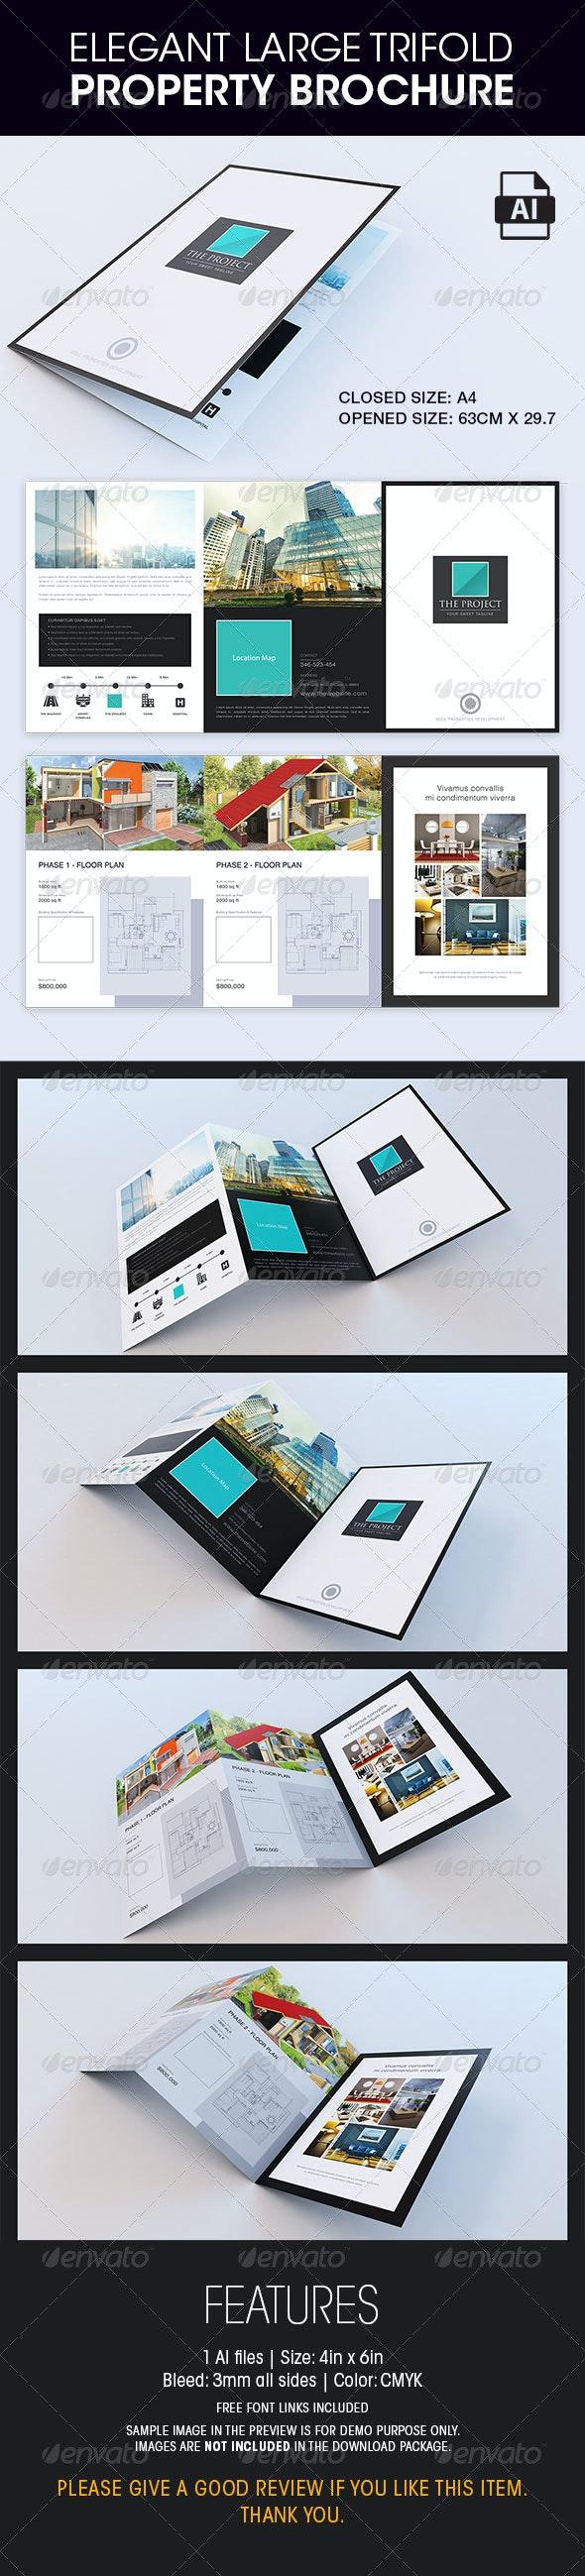 Elegant Large Trifold Property Brochure - Corporate Brochures